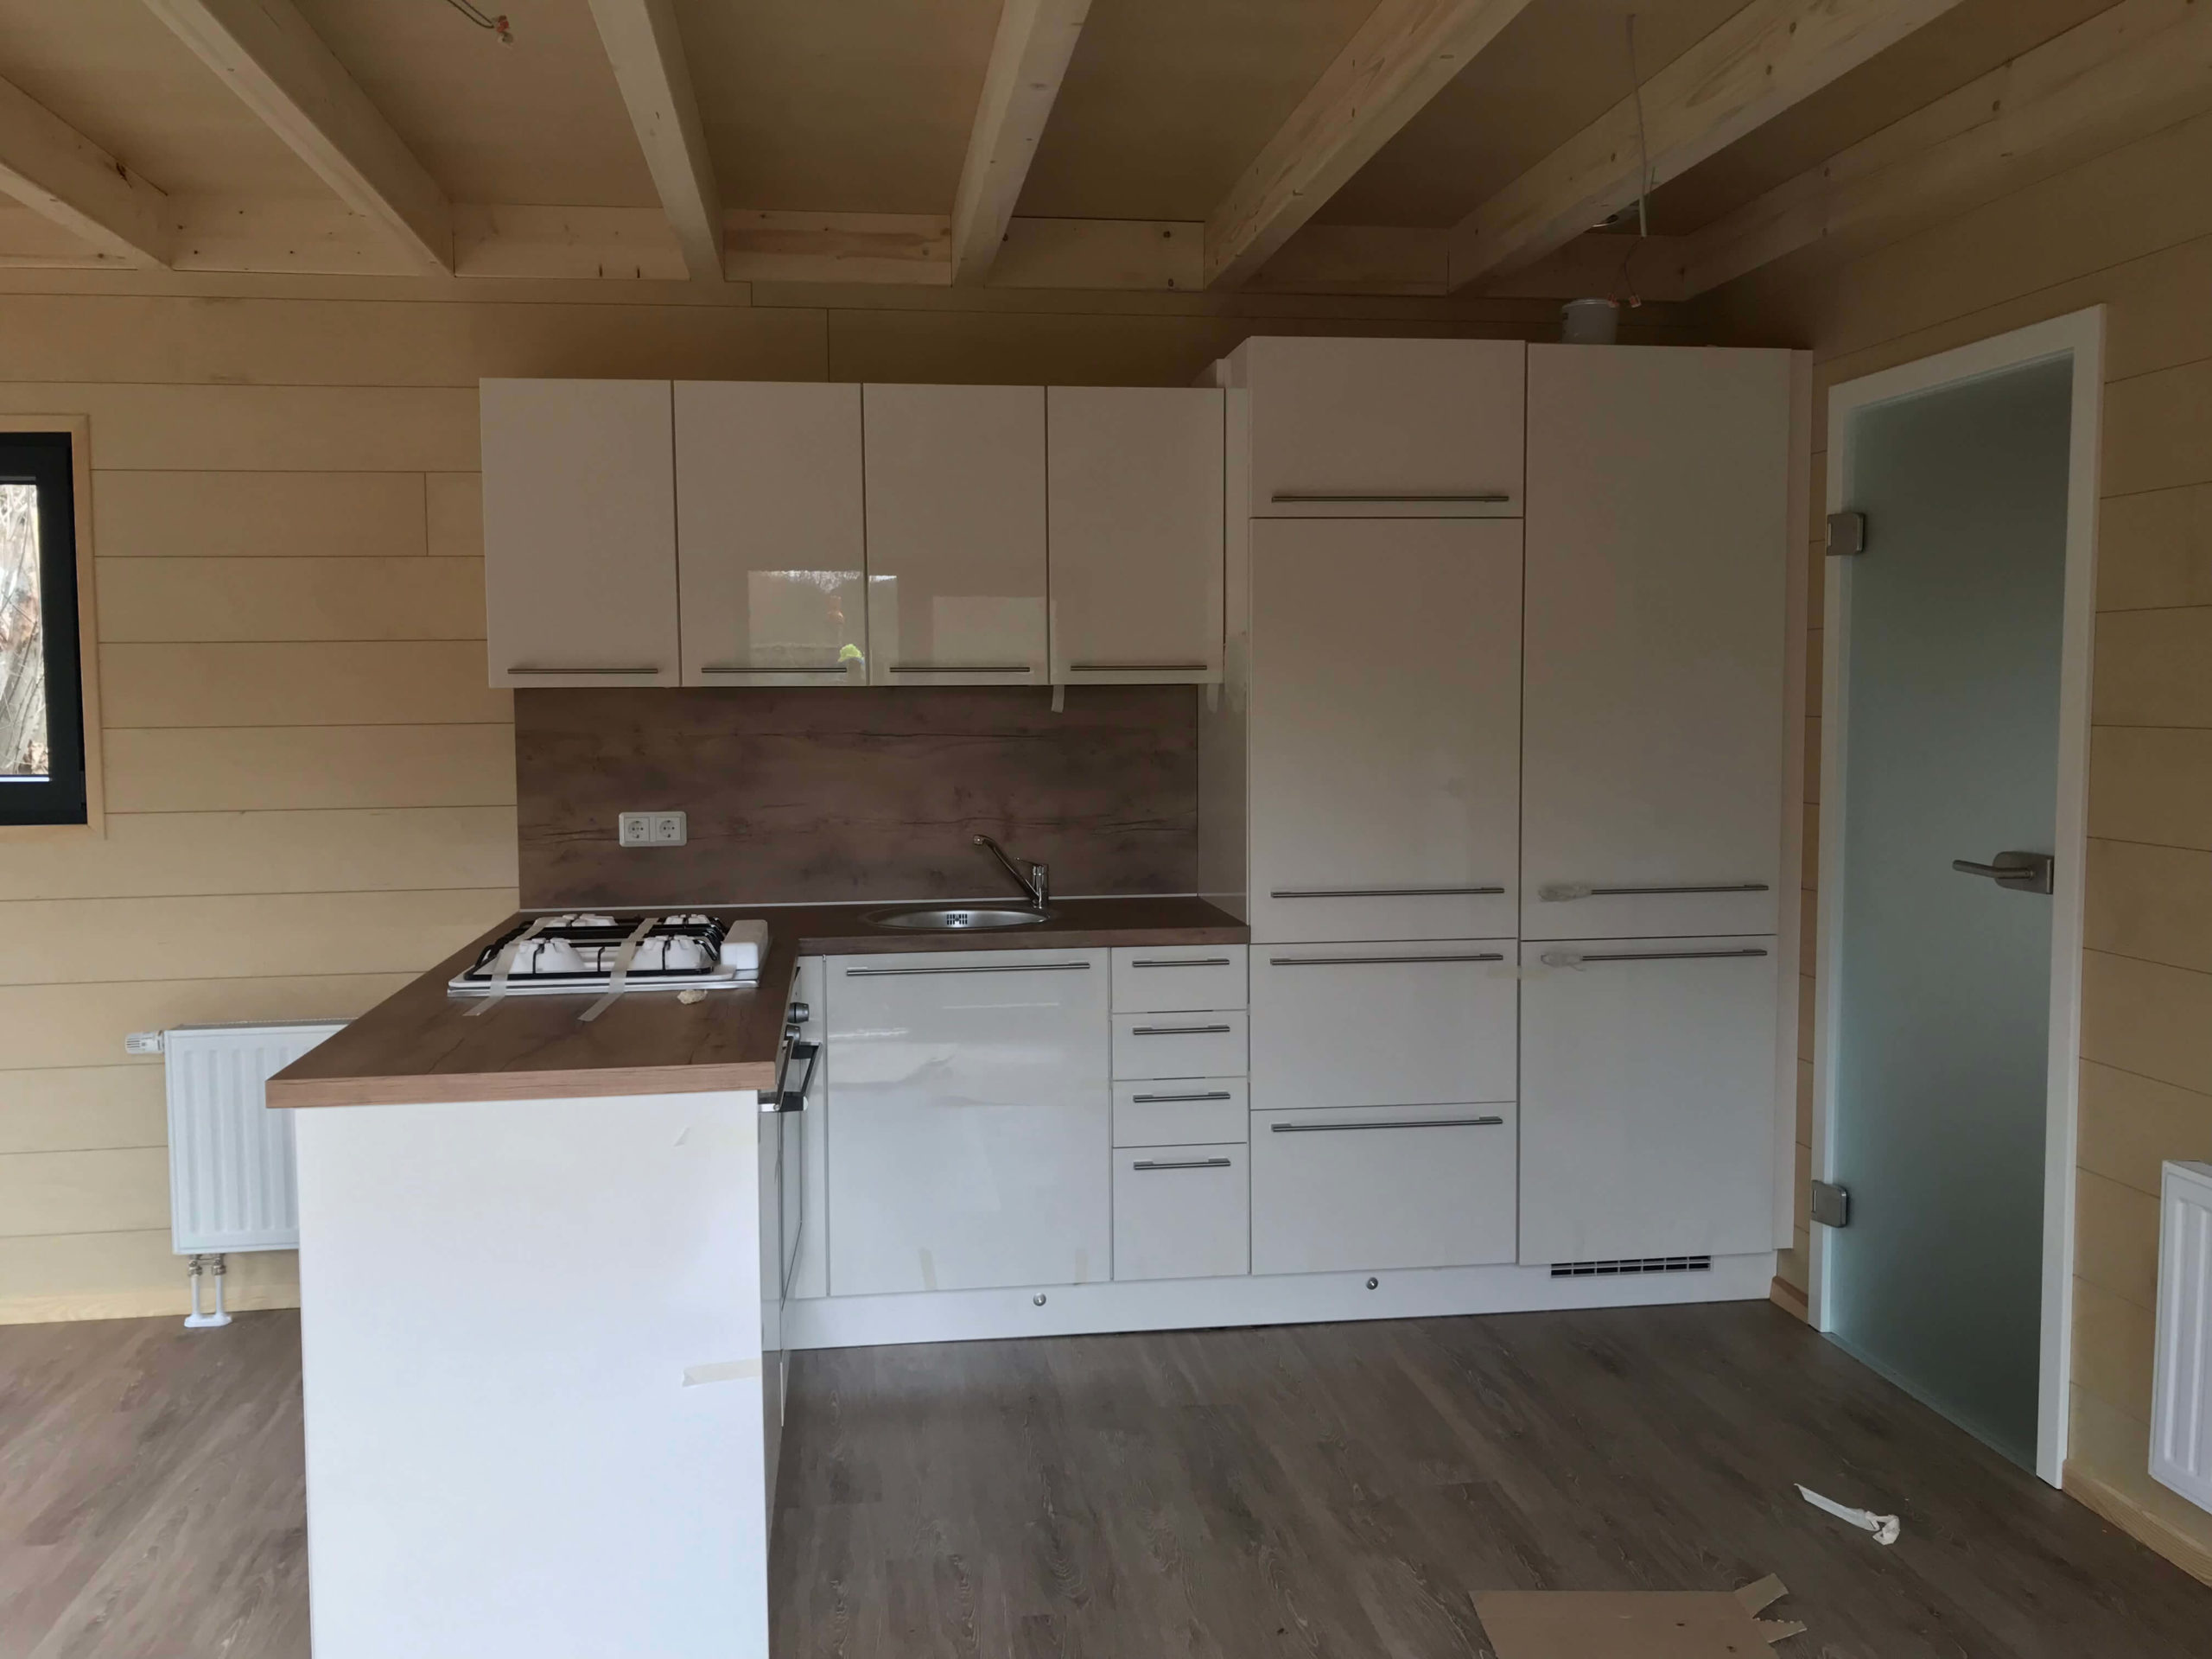 gebautes-chalet-valk-vital-camp-gmbh07